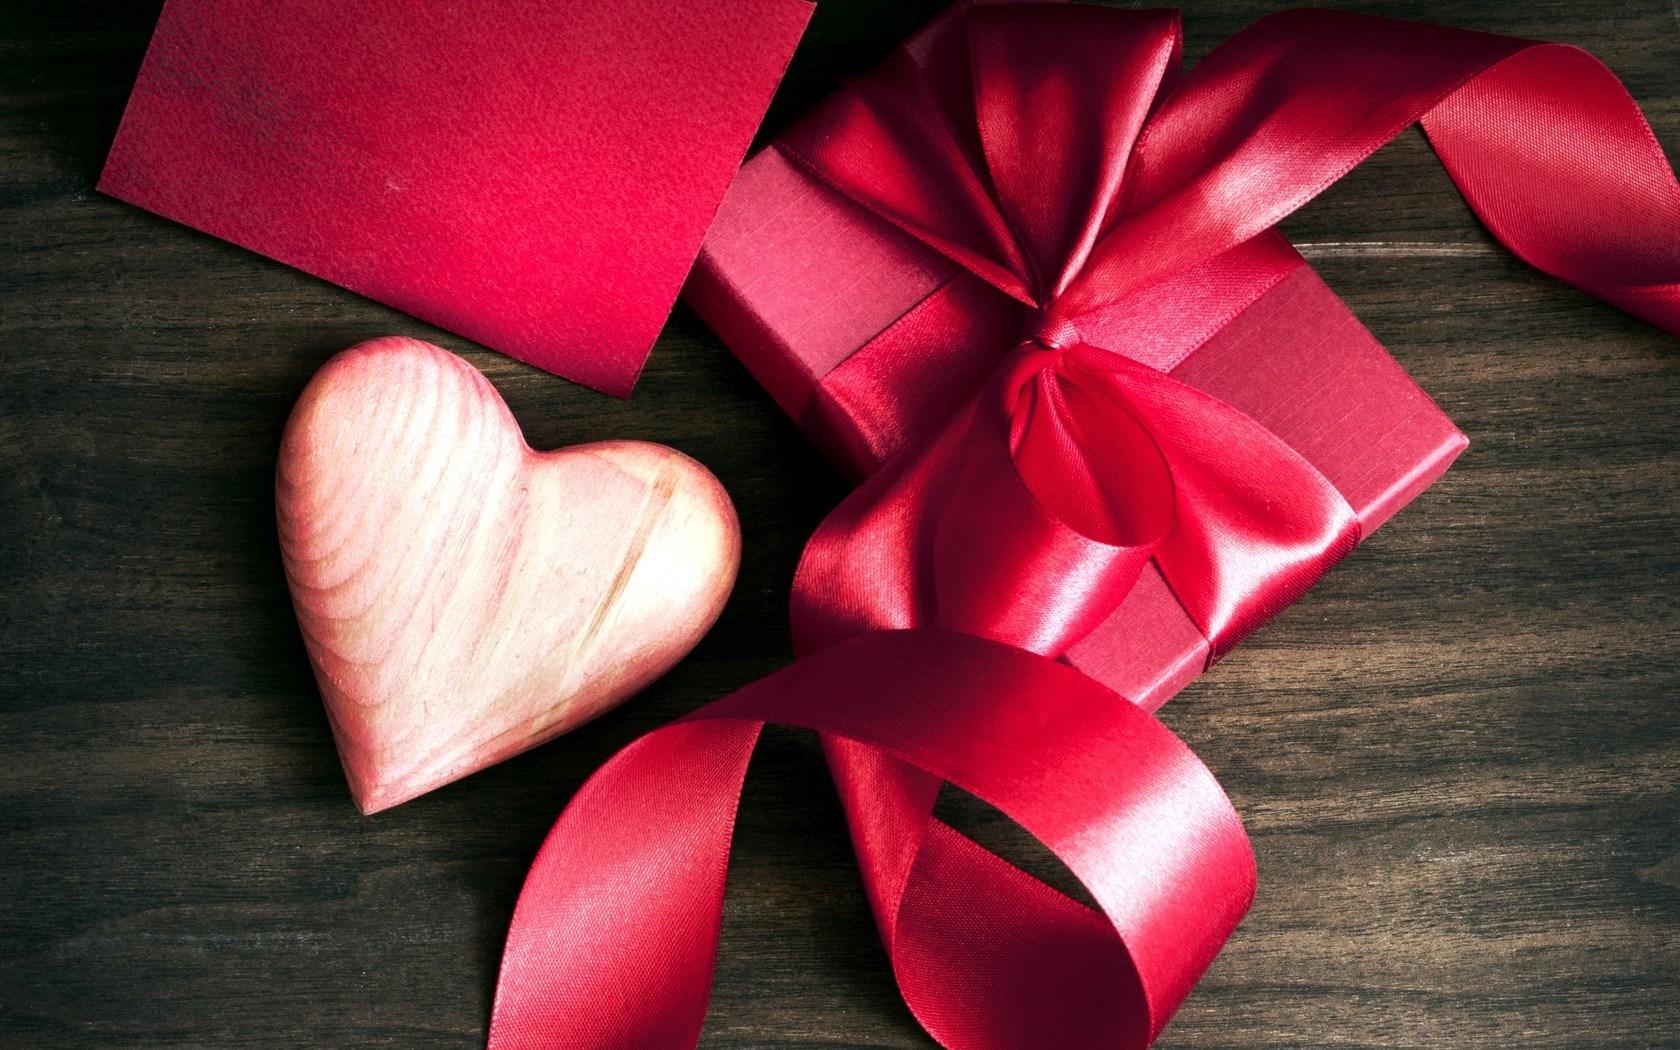 Heart Gift Ribbon Bow Box Love